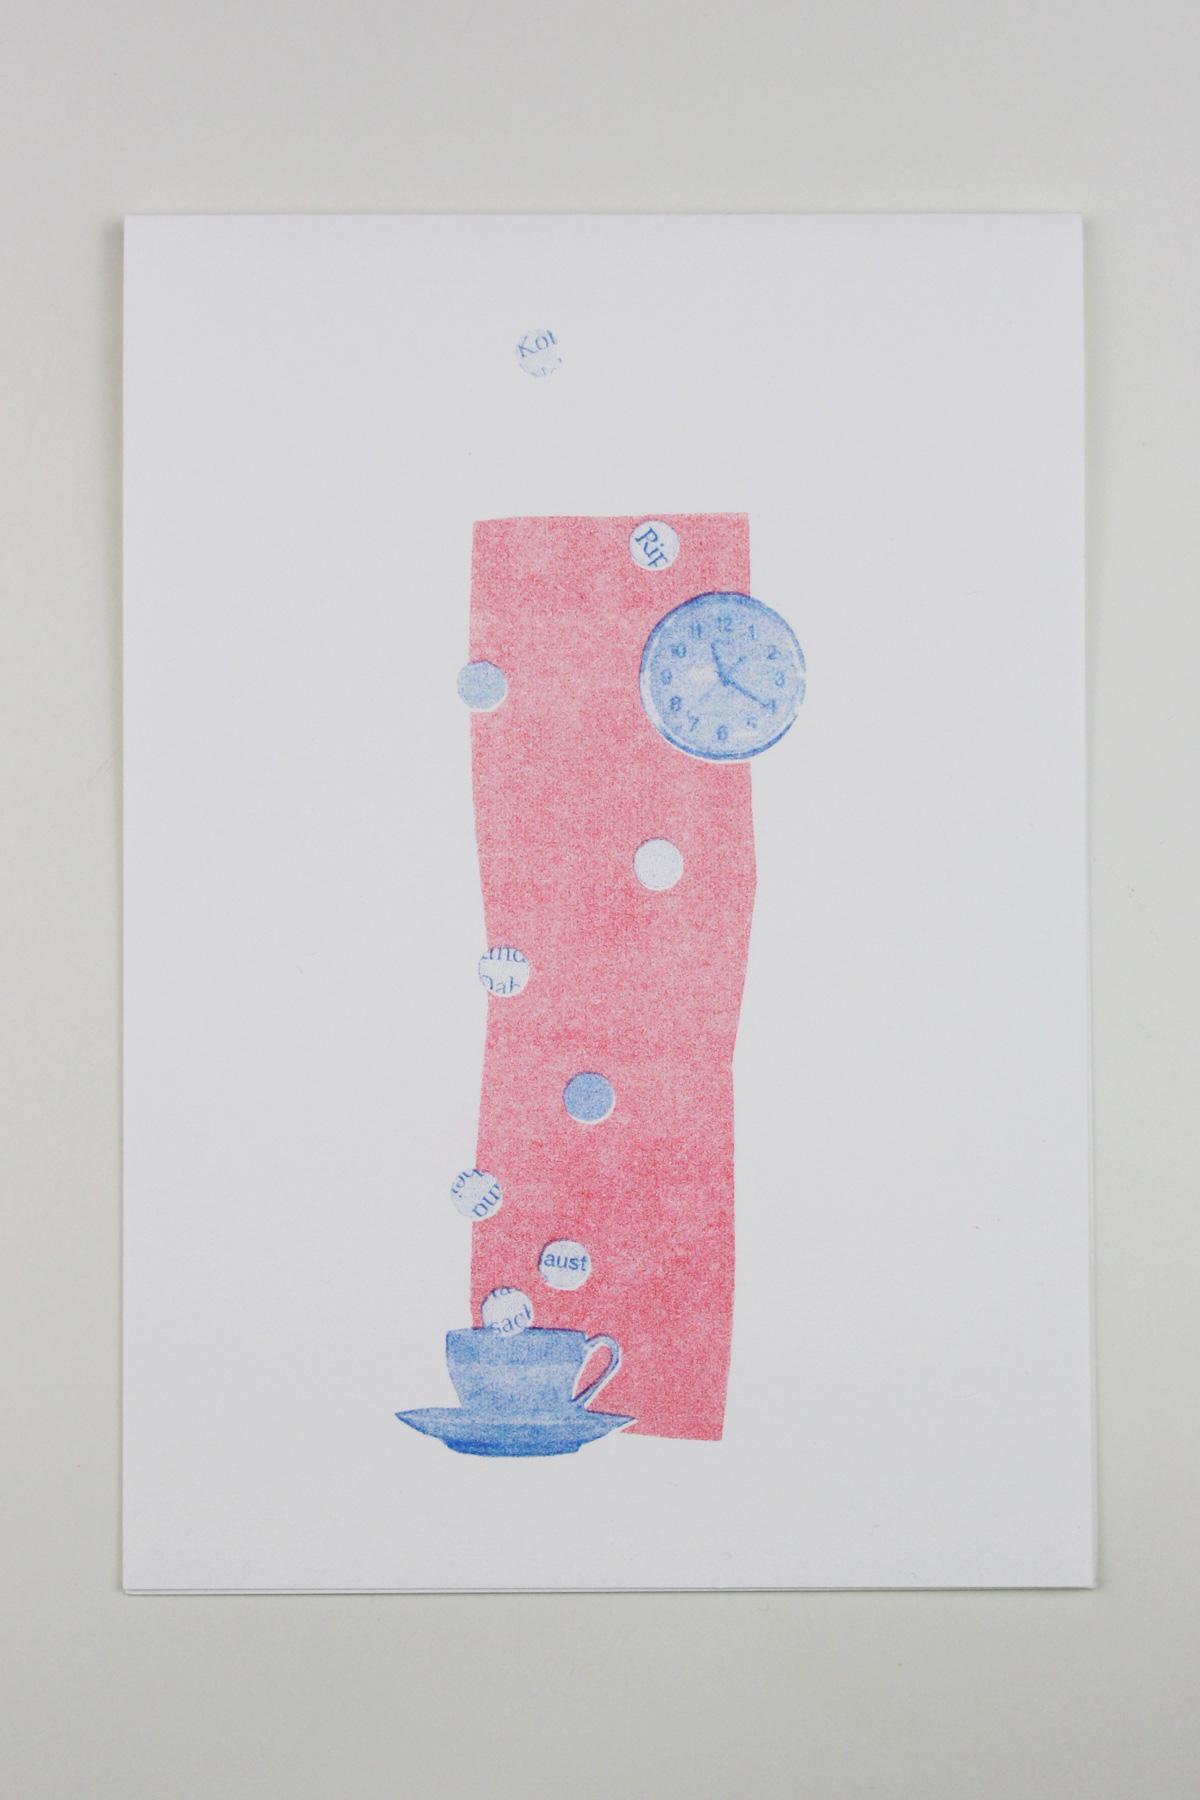 postkarte_collage_illustration_kathleen_gust_riso_druck_valentinstag_handlettering1